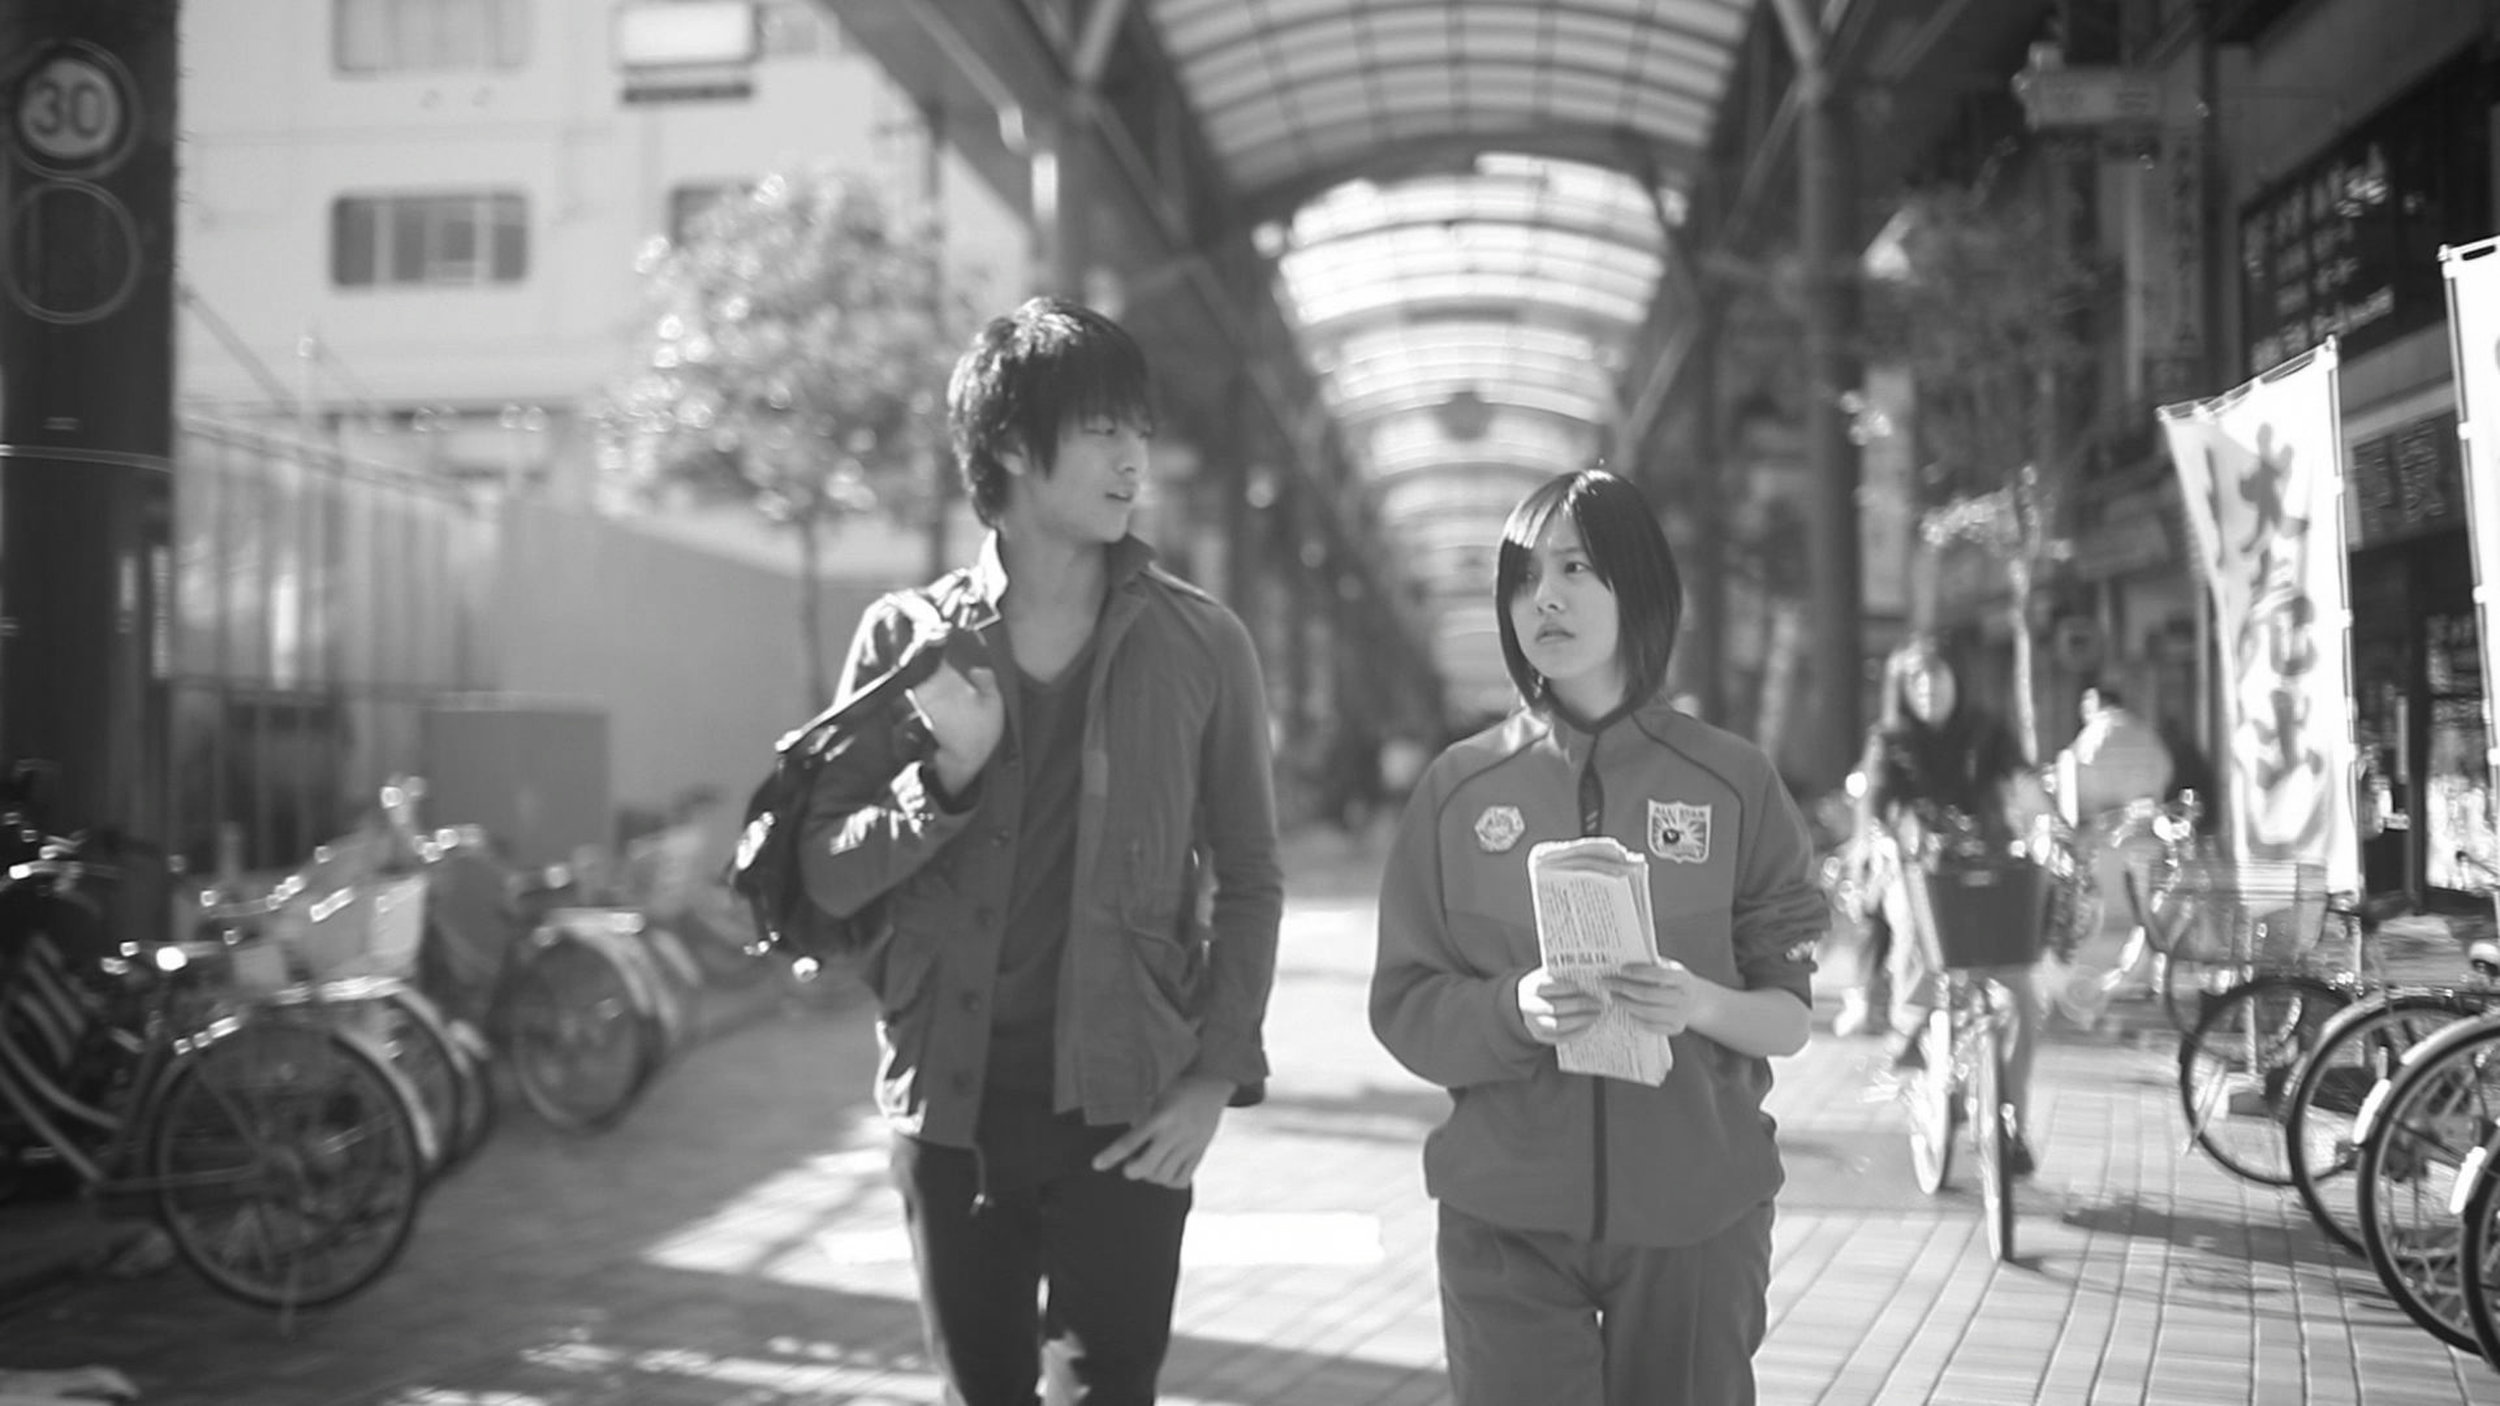 About_the_Pink_Sky_filmstill6_TsubasaTakayama_AiIkeda_byKeiichiKobayashi copy.jpg